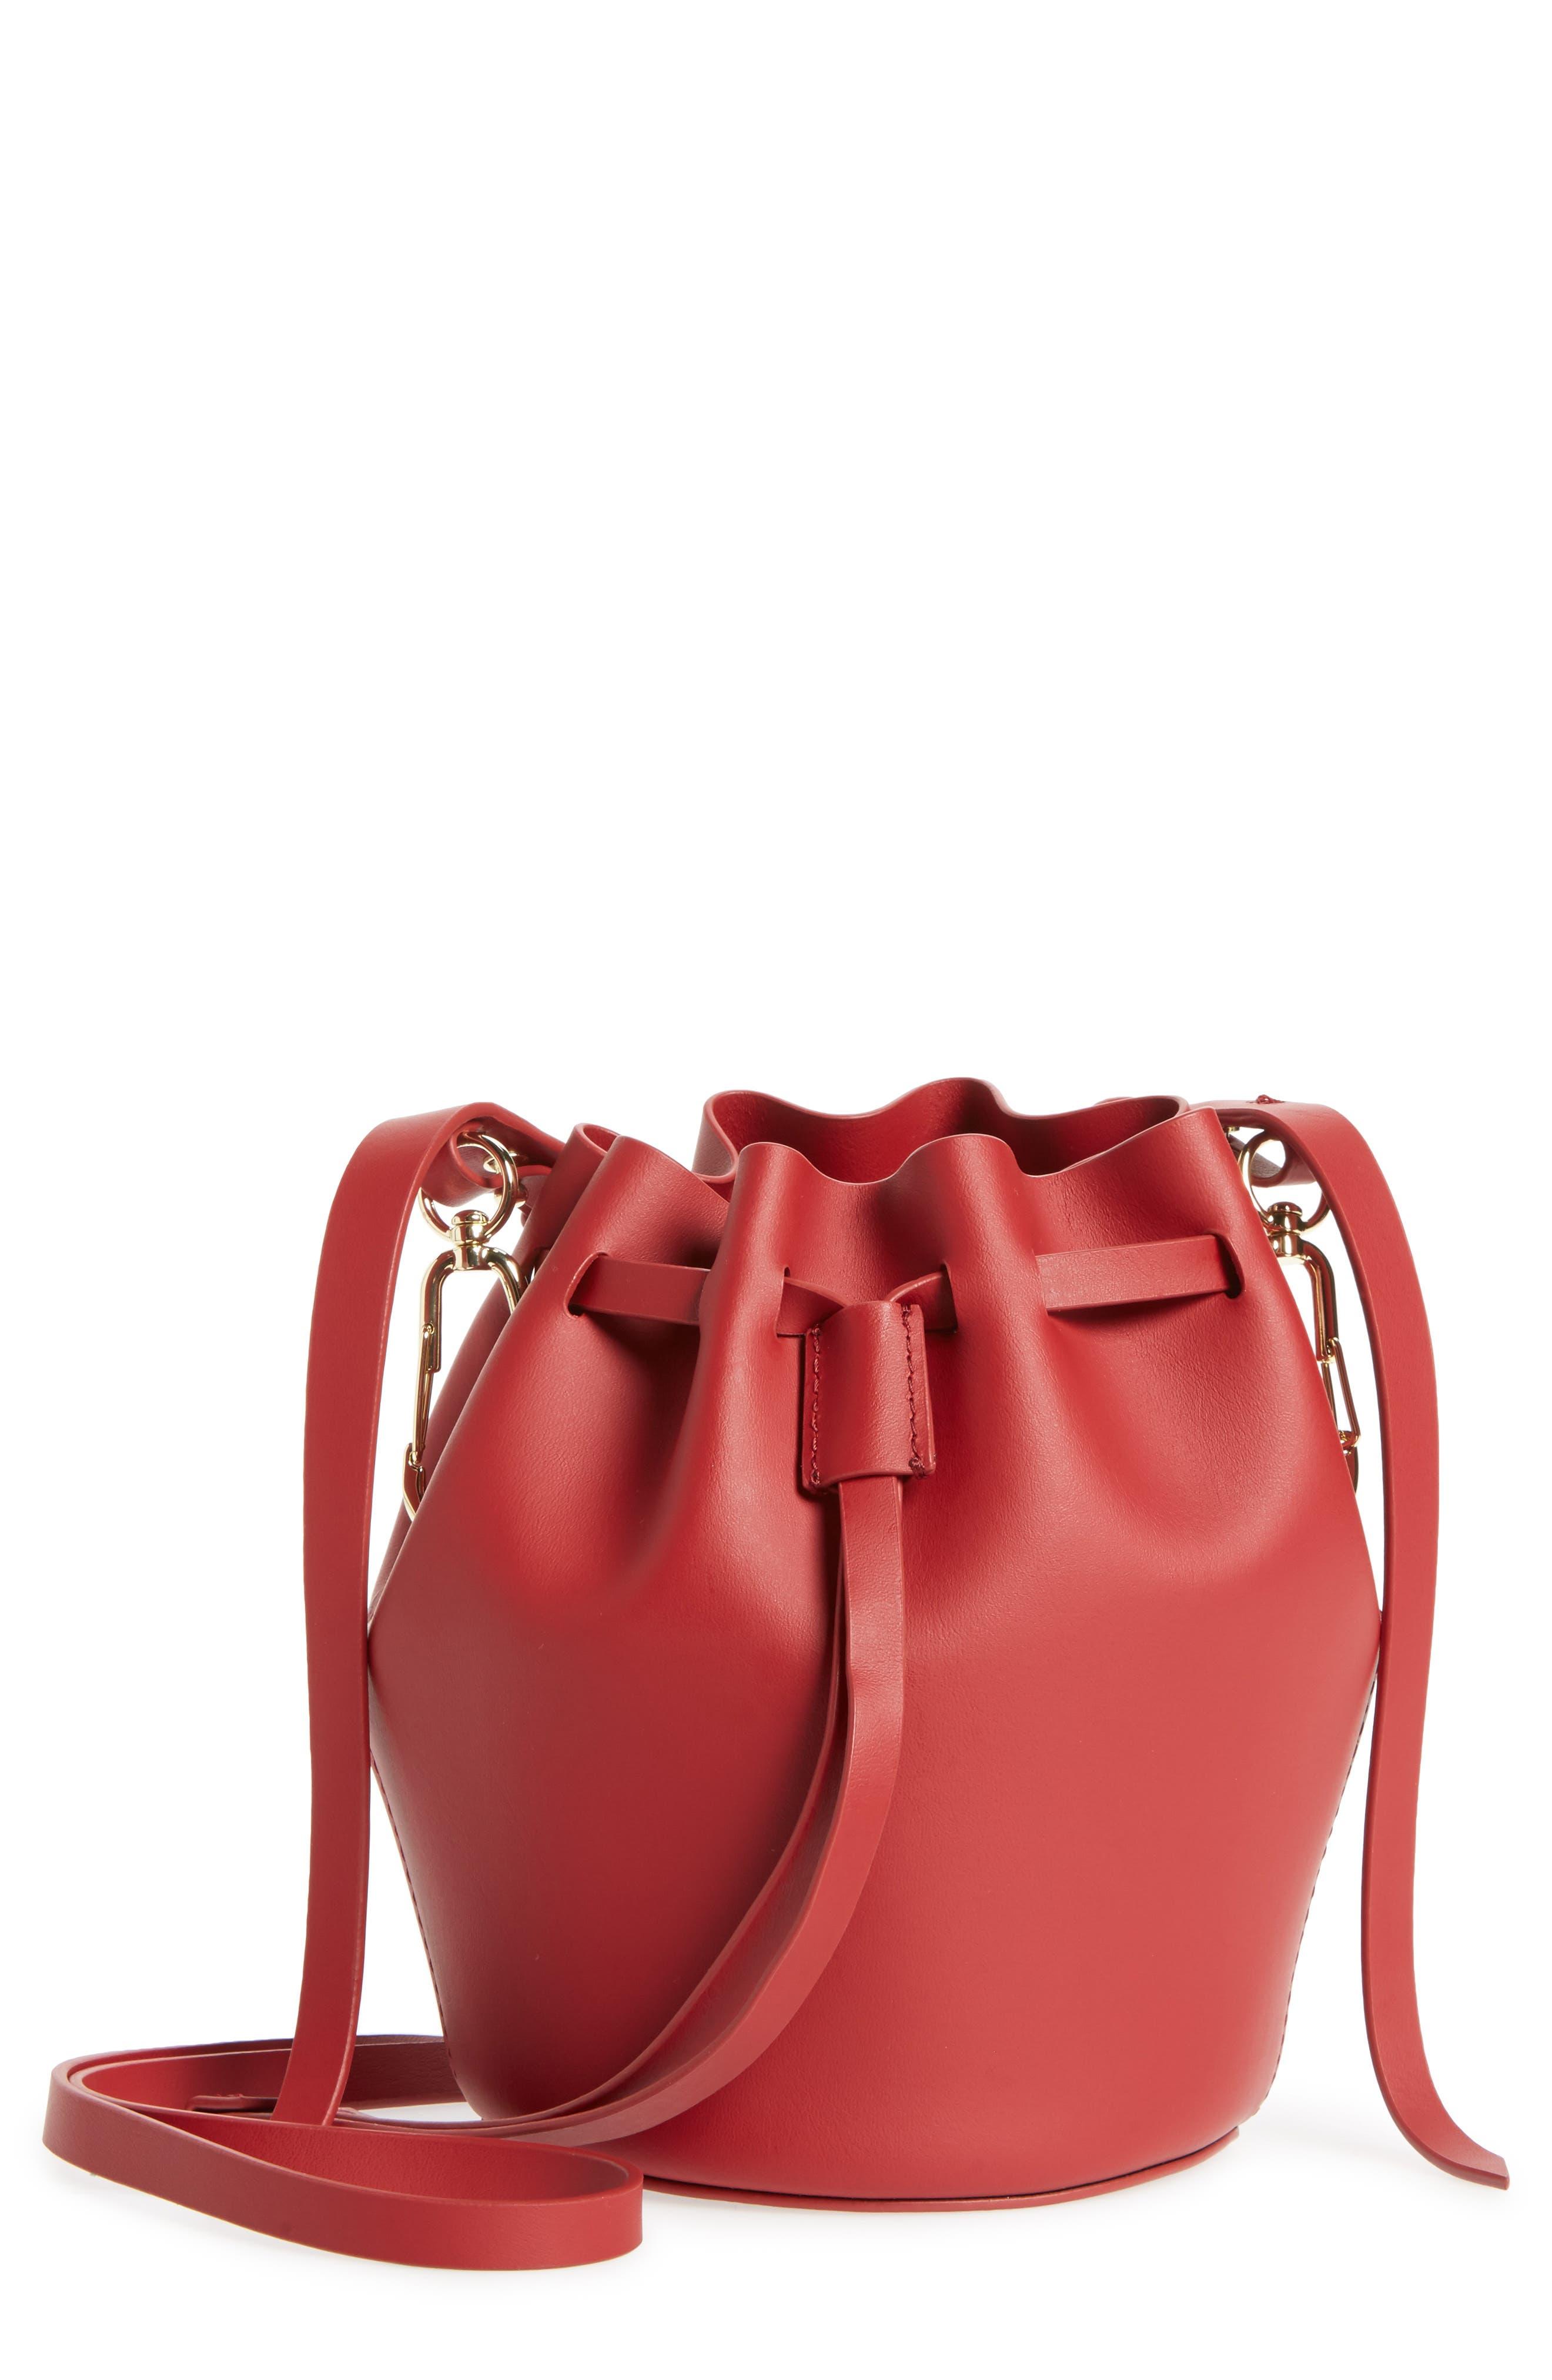 ZAC Zac Posen Mini Belay Calfskin Leather Drawstring Bag